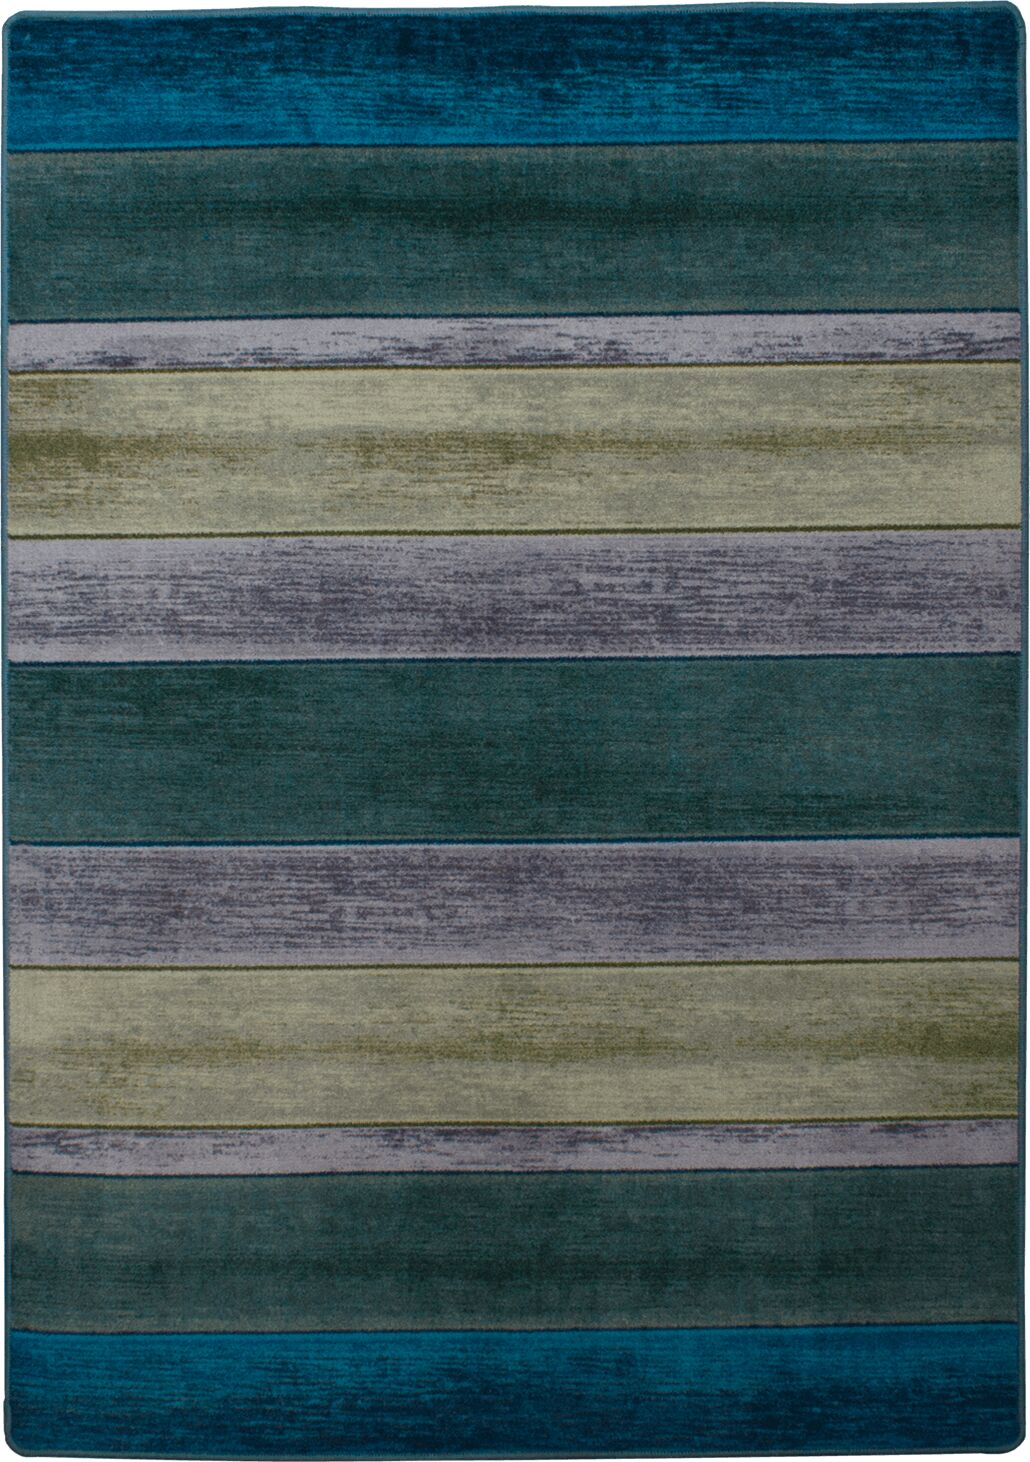 Coastal Bungalow Stripe Aqua Area Rug Rug Size: Rectangle 8' x 11'